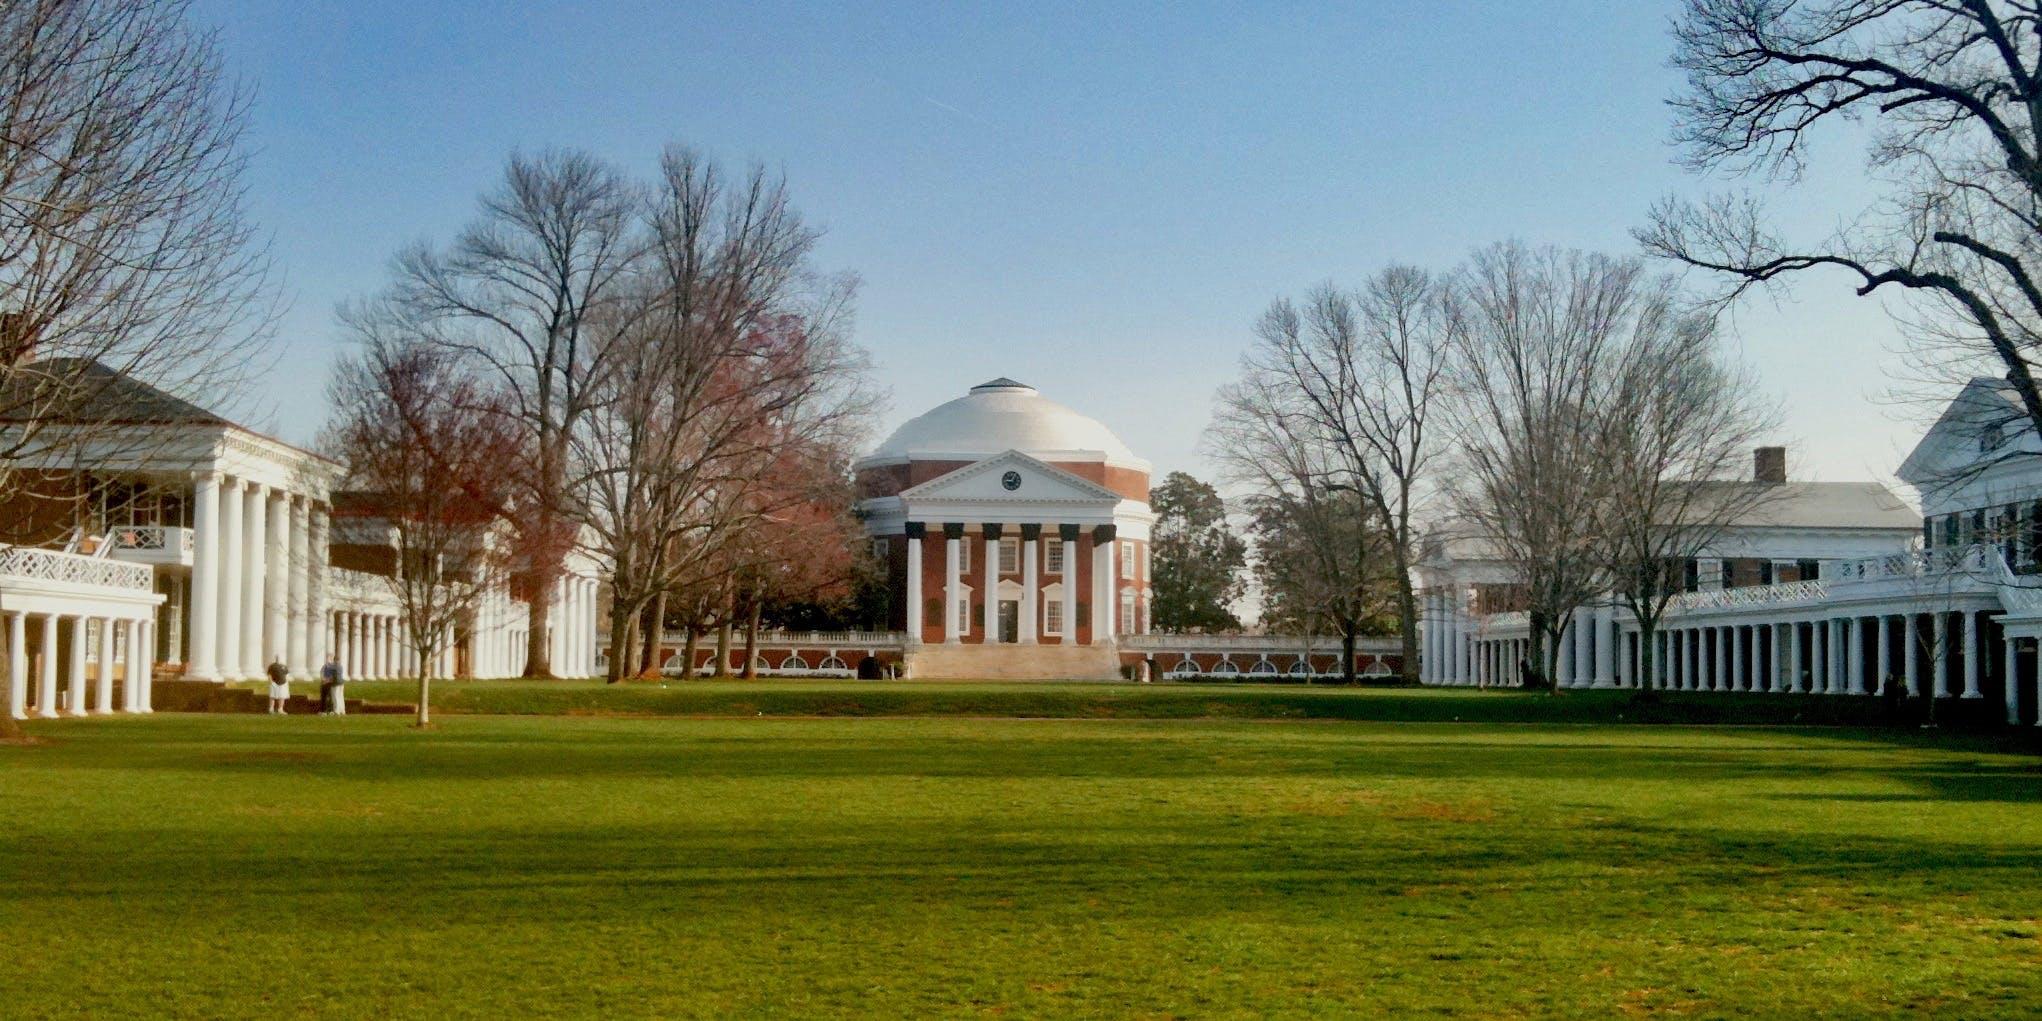 University of Virginia's Rotunda.